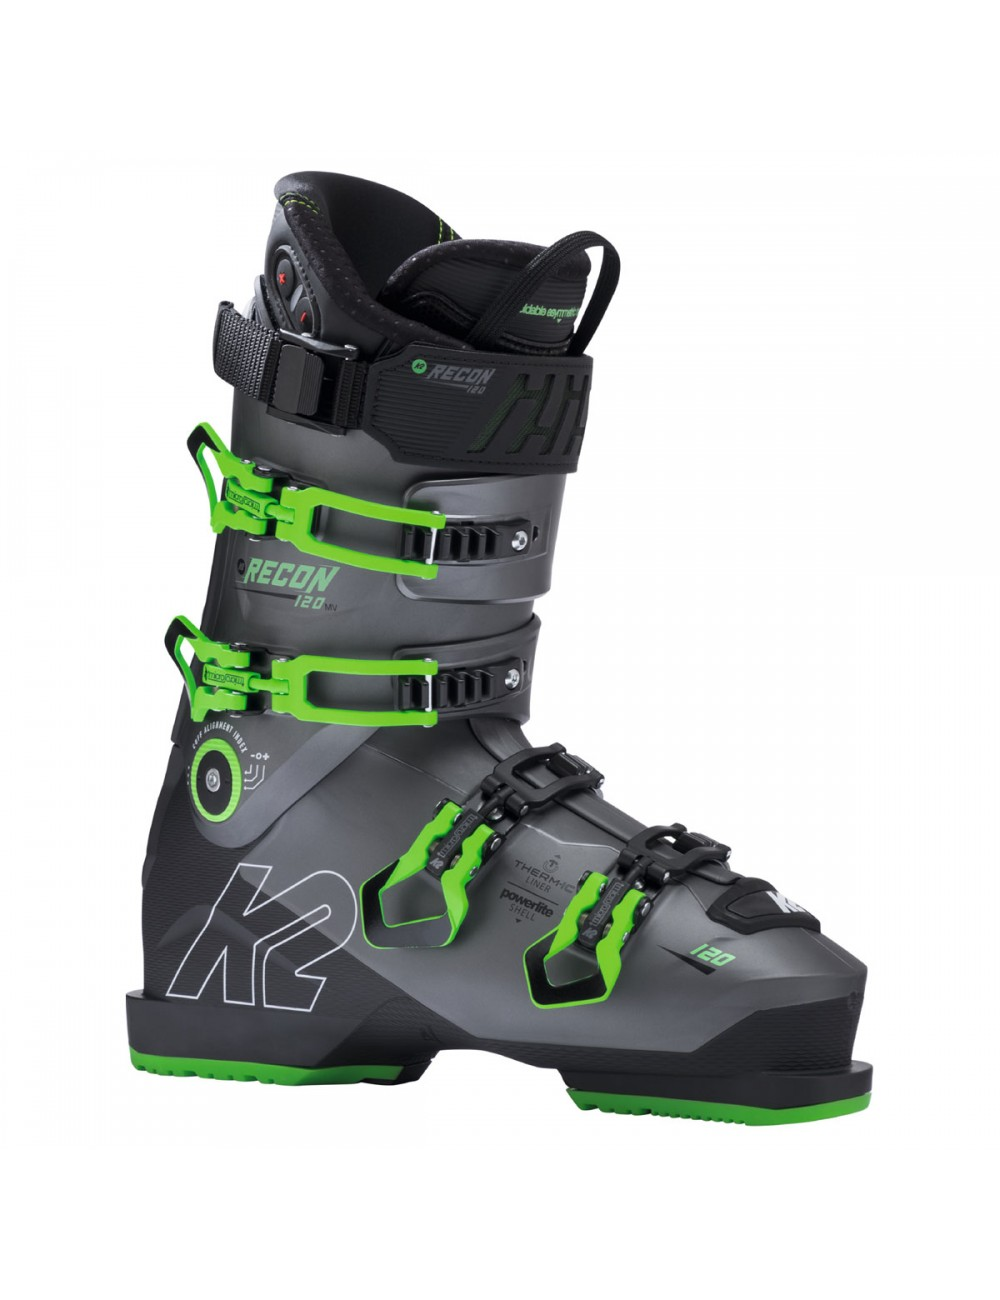 K2 Recon 120 Boot_1000323